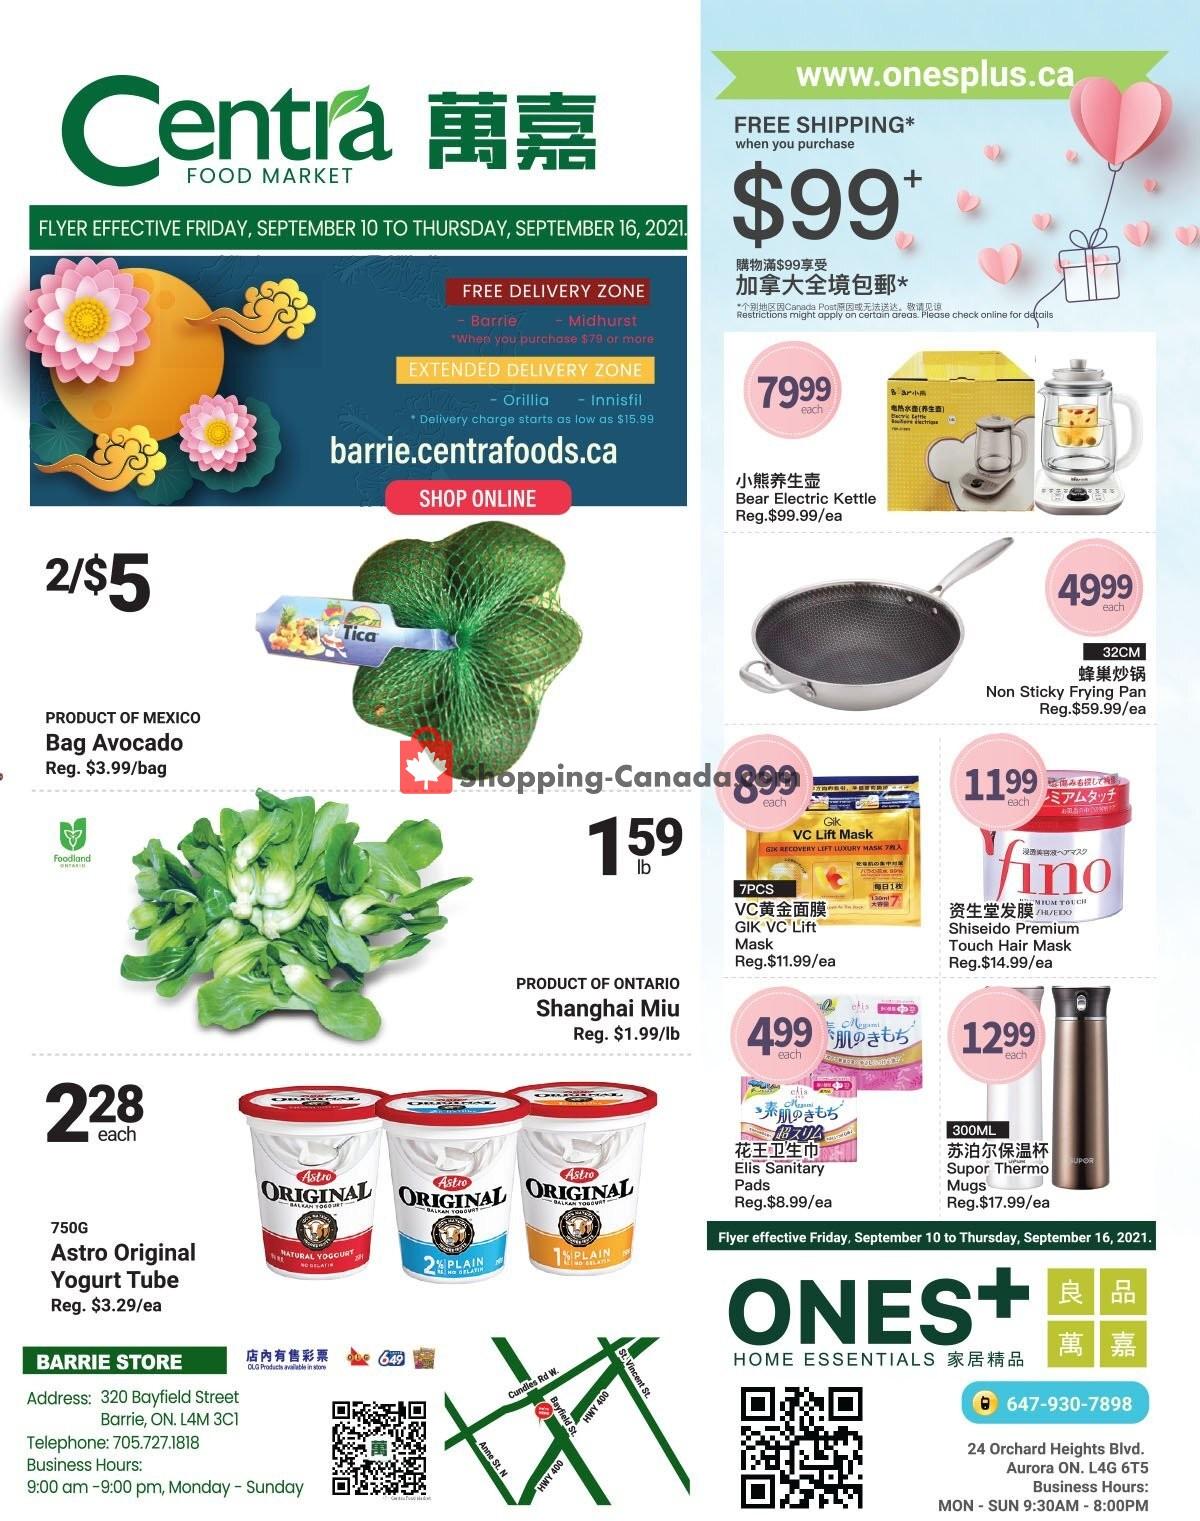 Flyer Centra Food Market Canada - from Friday September 10, 2021 to Thursday September 16, 2021